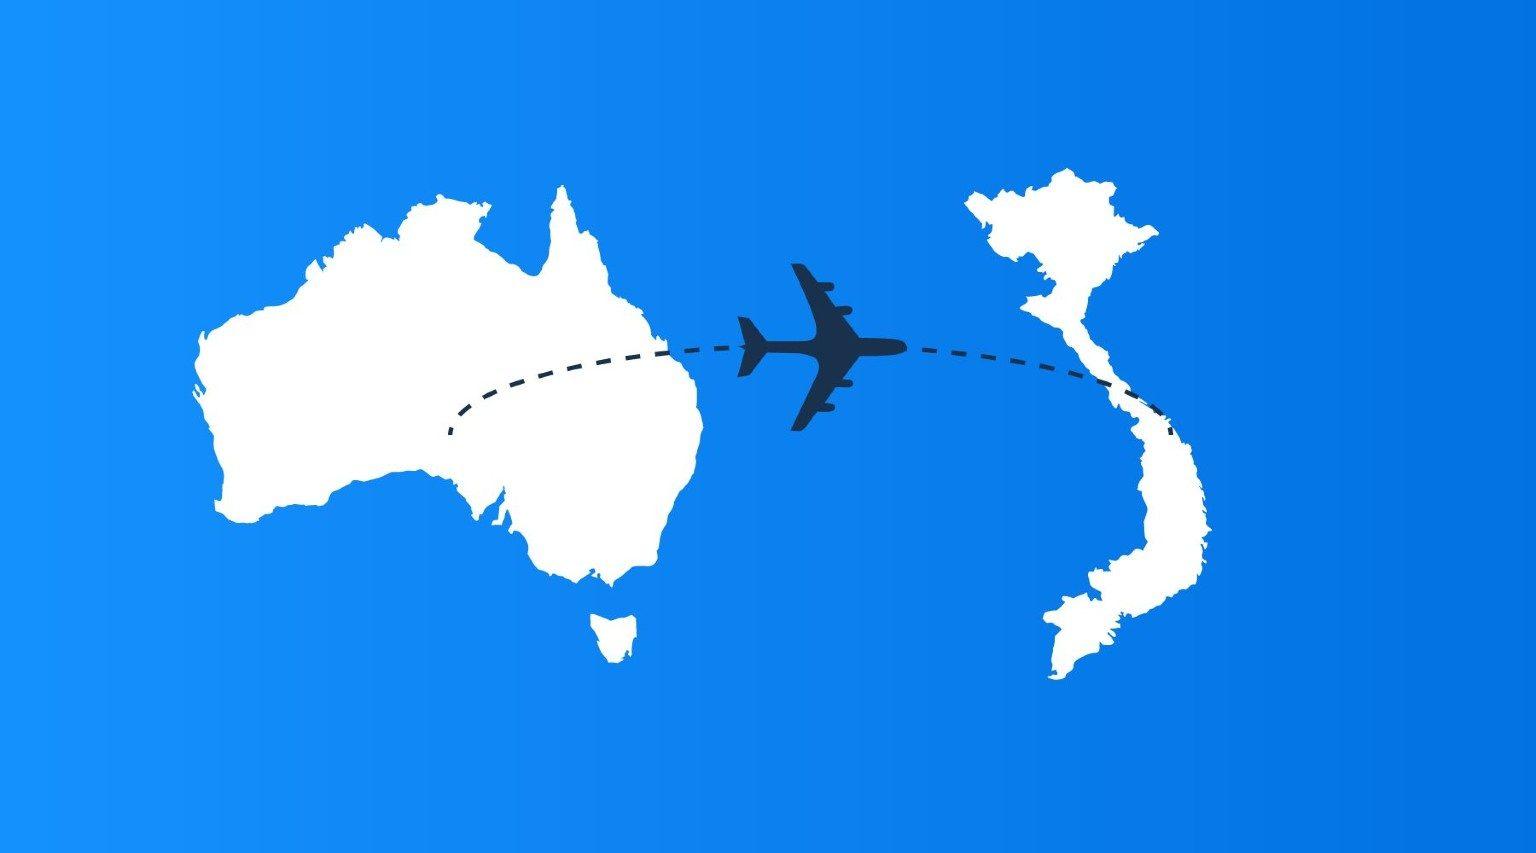 From Australia to Vietnam map